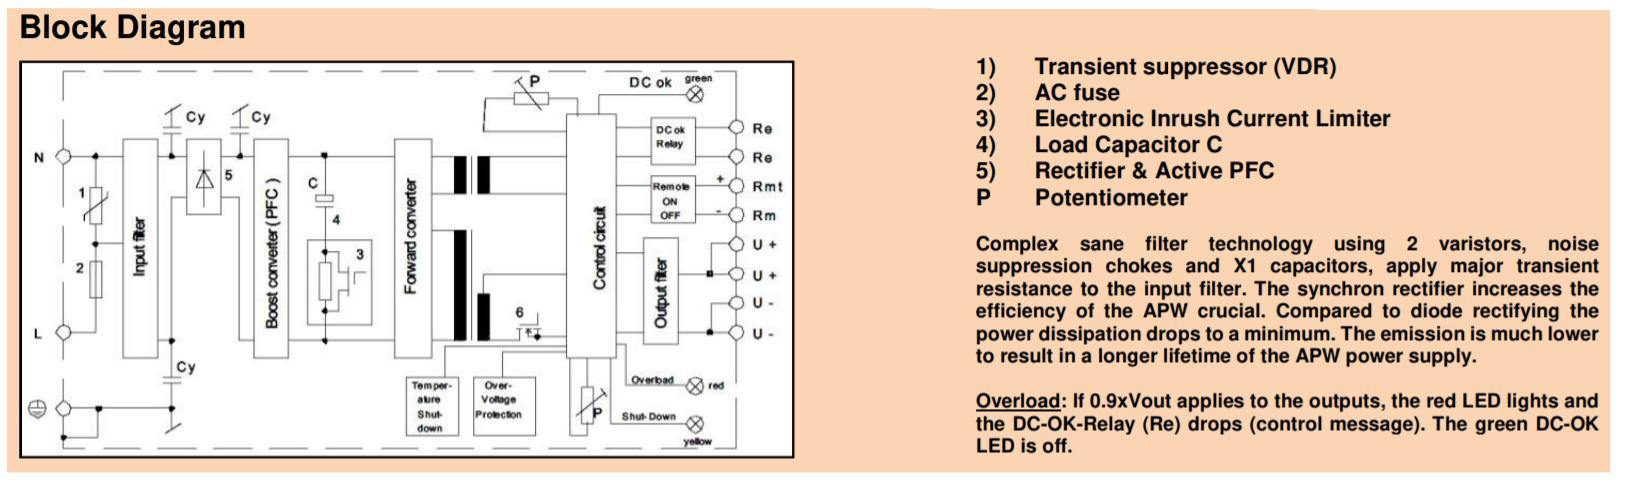 hight resolution of technical illustration